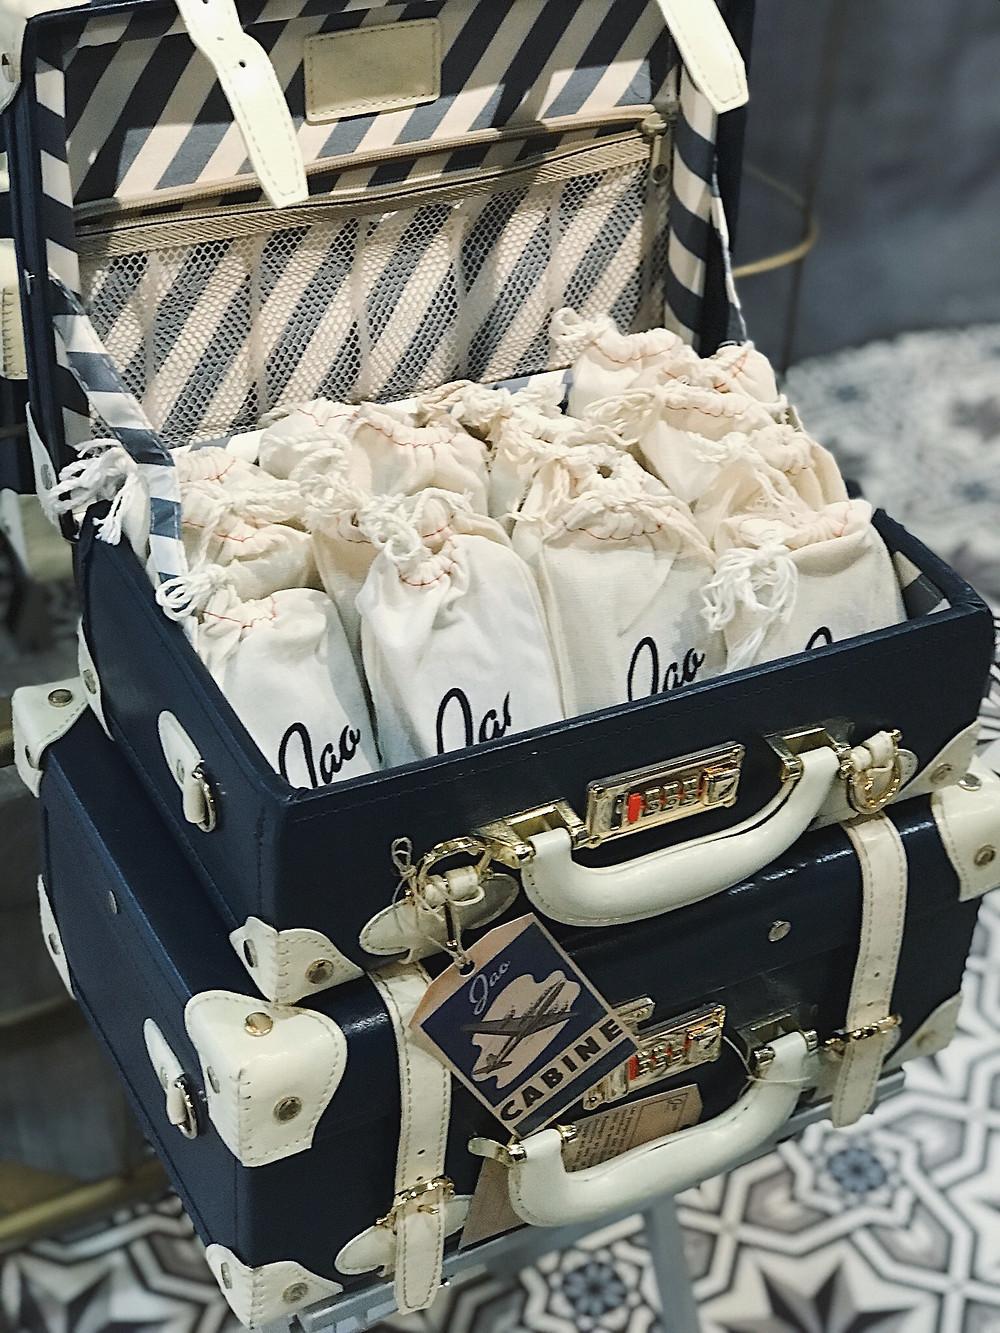 Jao travel accessories